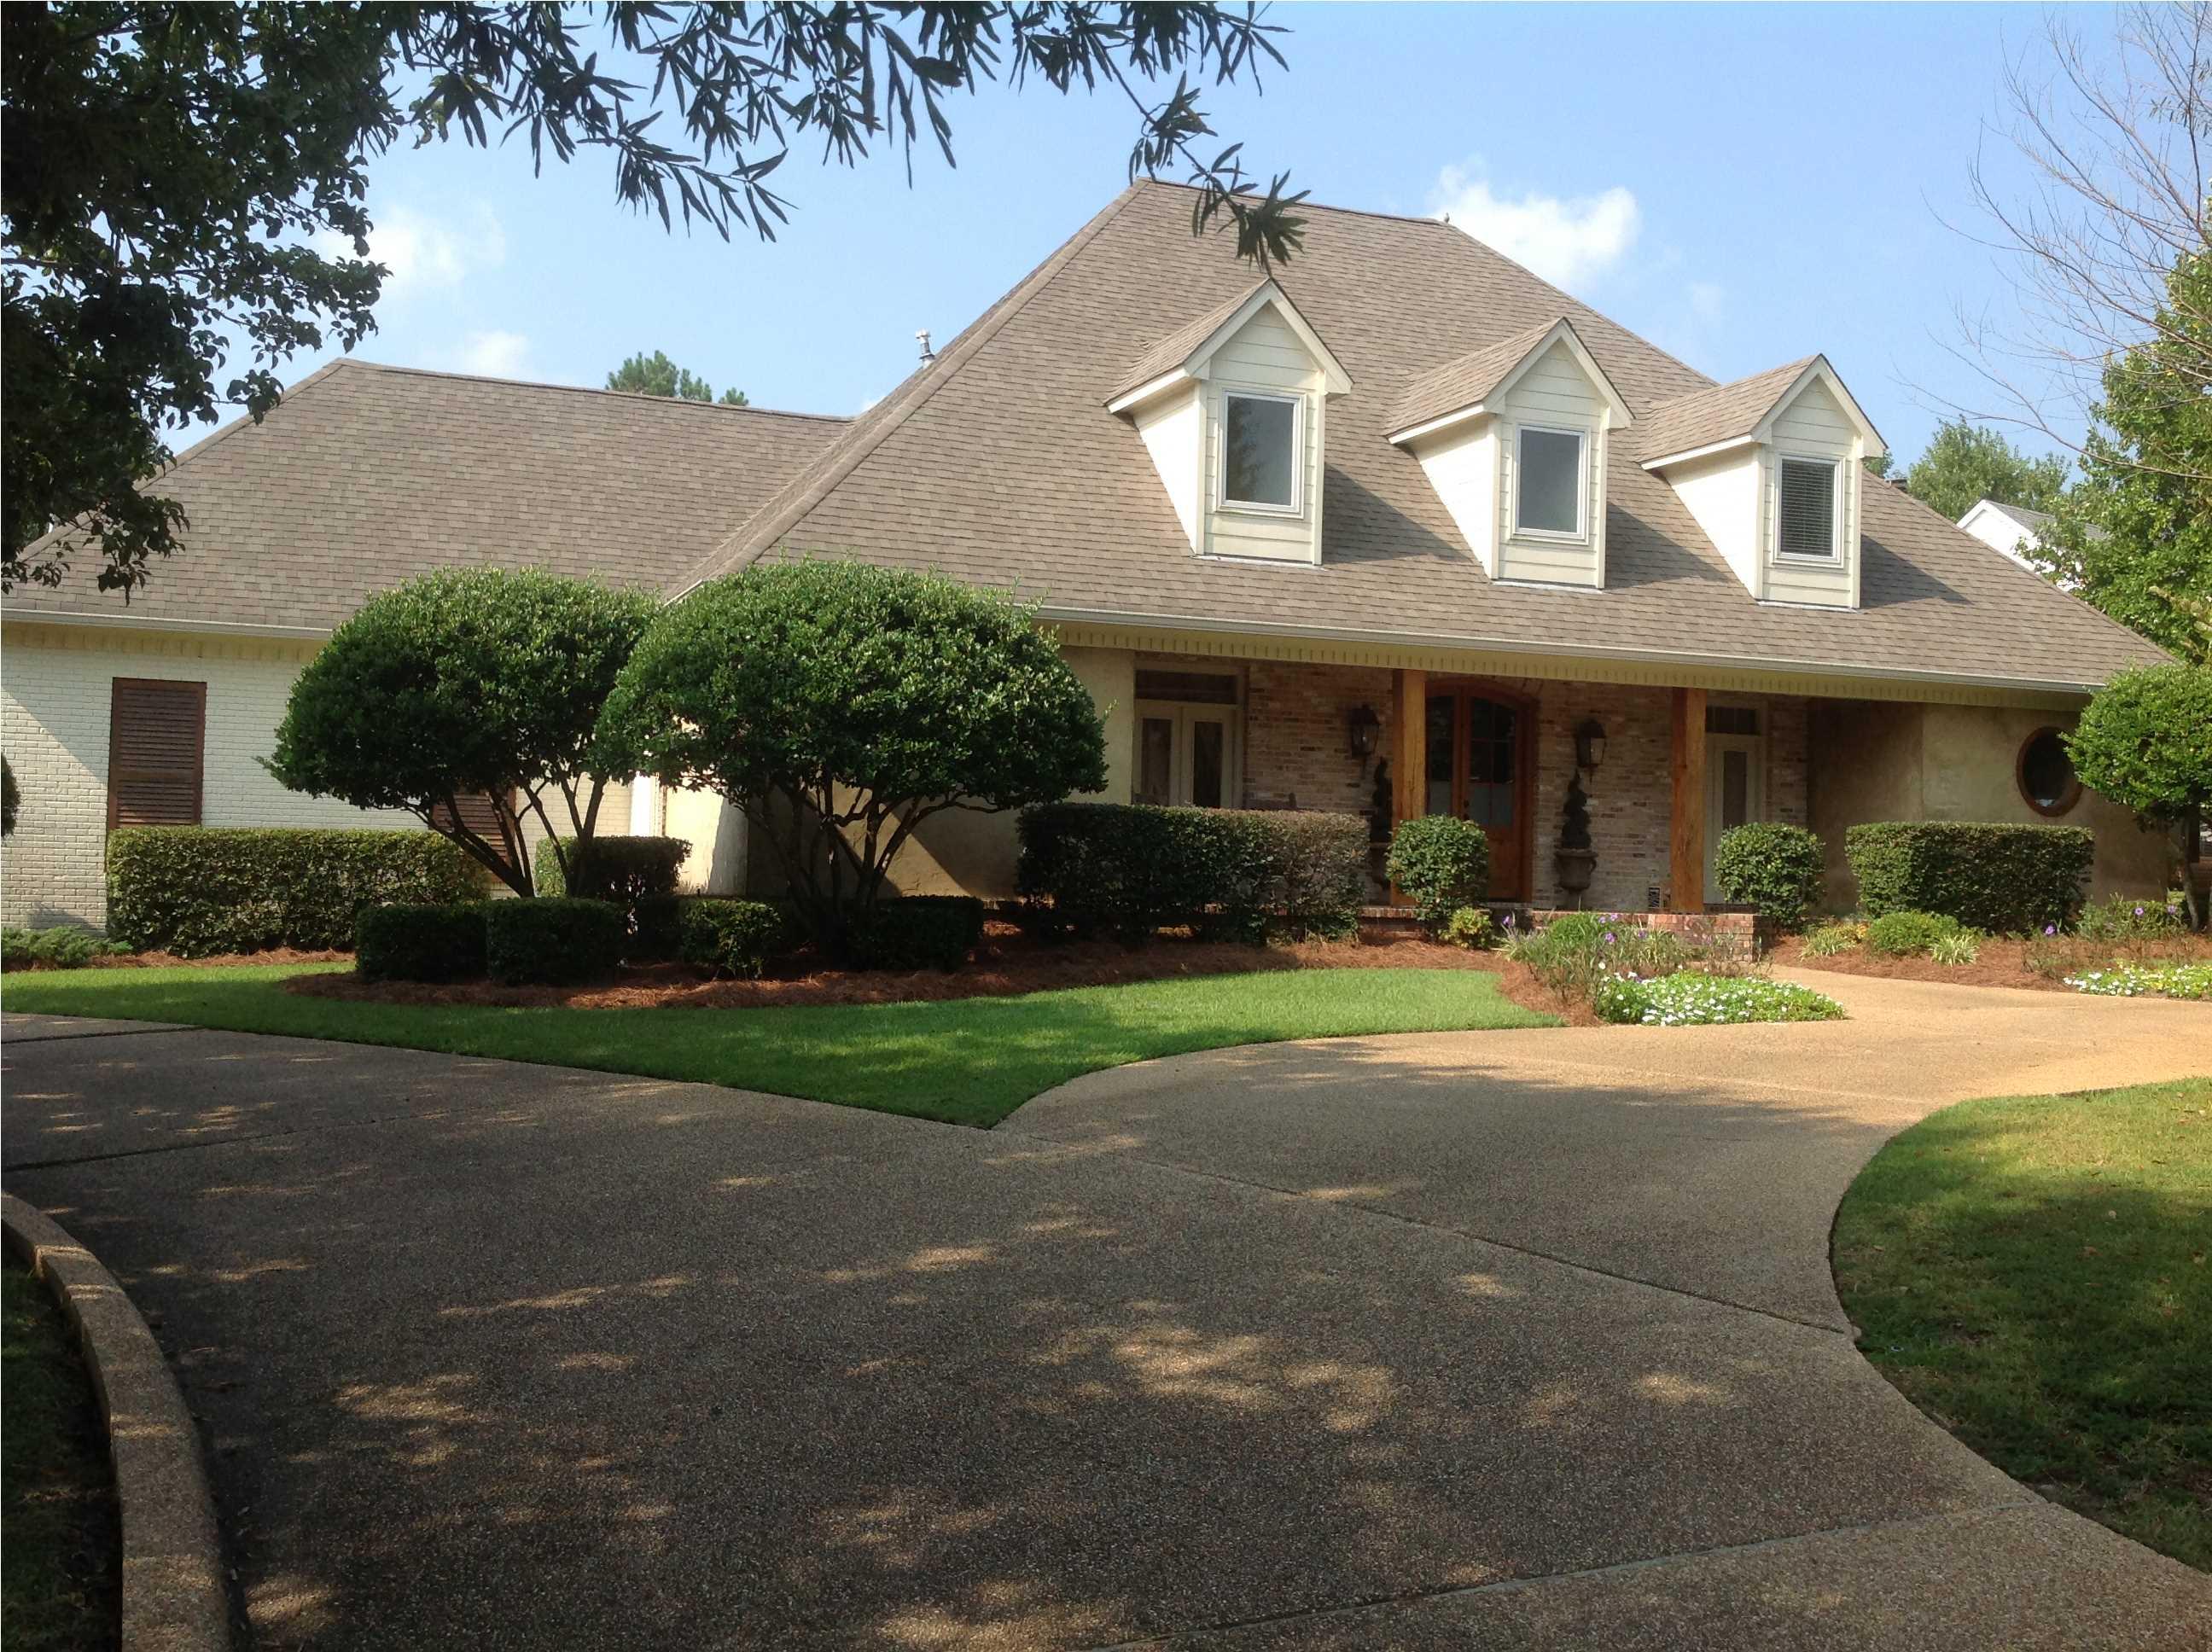 Real Estate for Sale, ListingId: 28611623, Ridgeland,MS39157